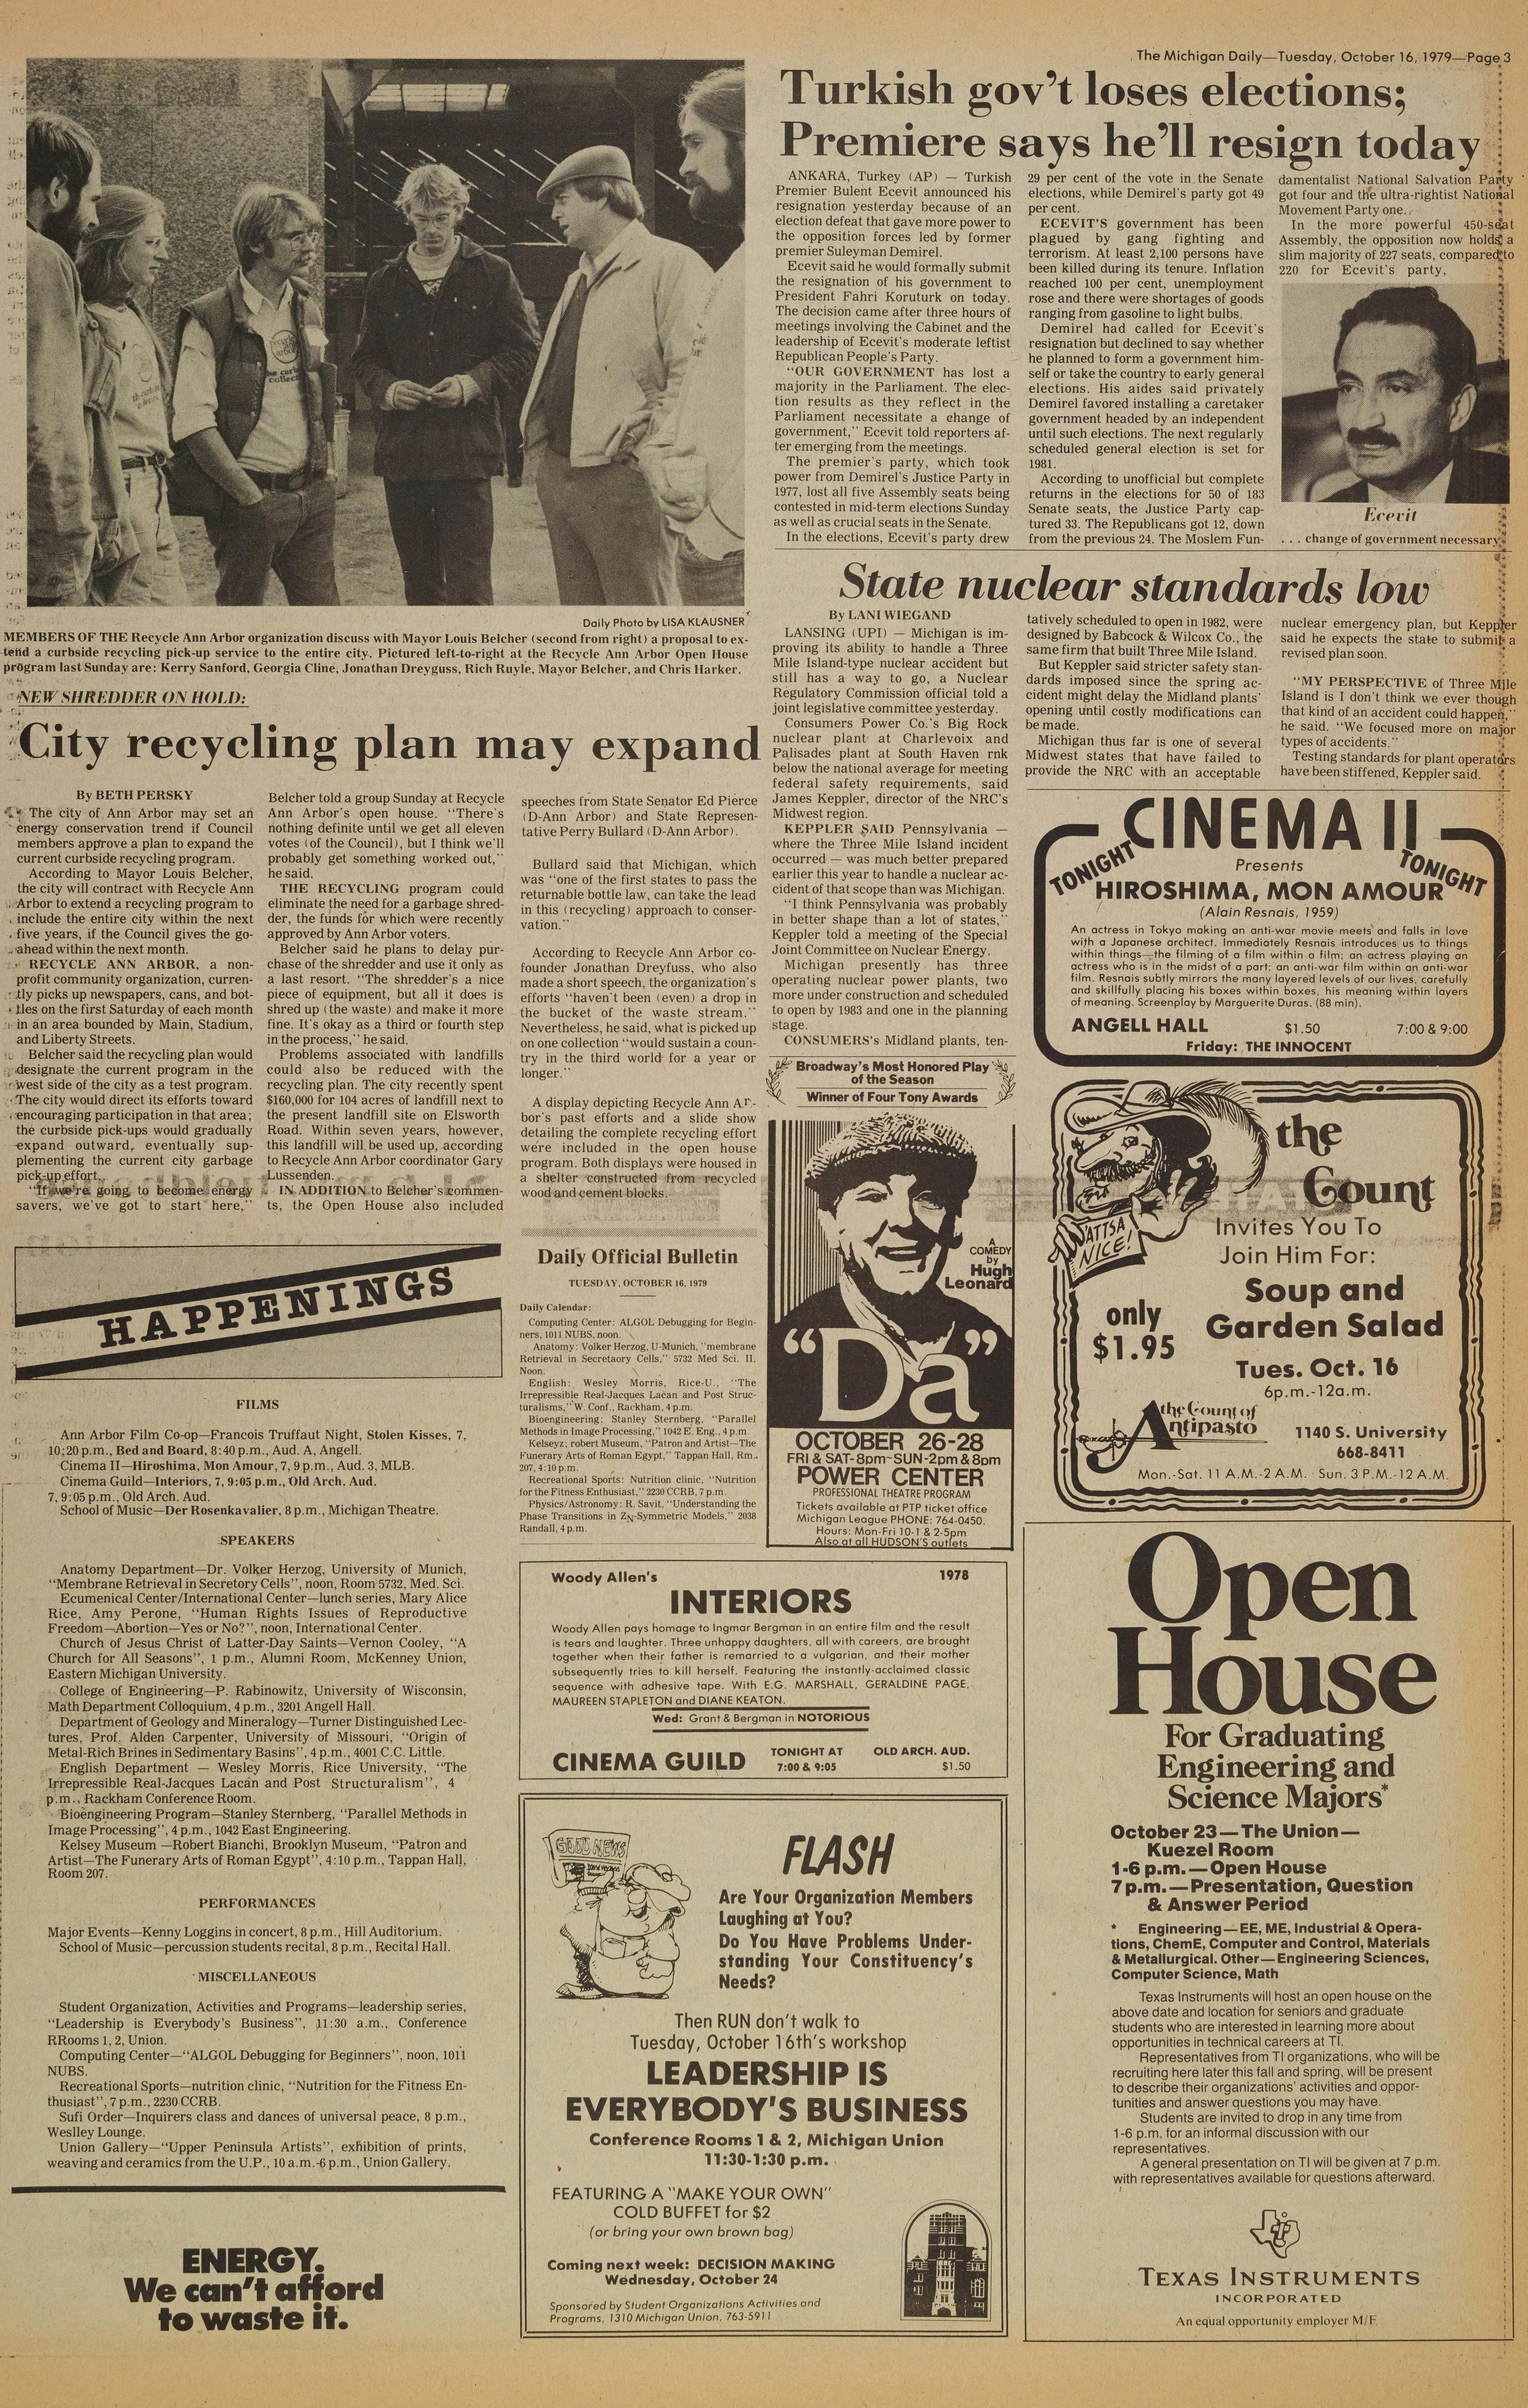 Michigan Daily Digital Archives - October 16, 1979 (vol  90